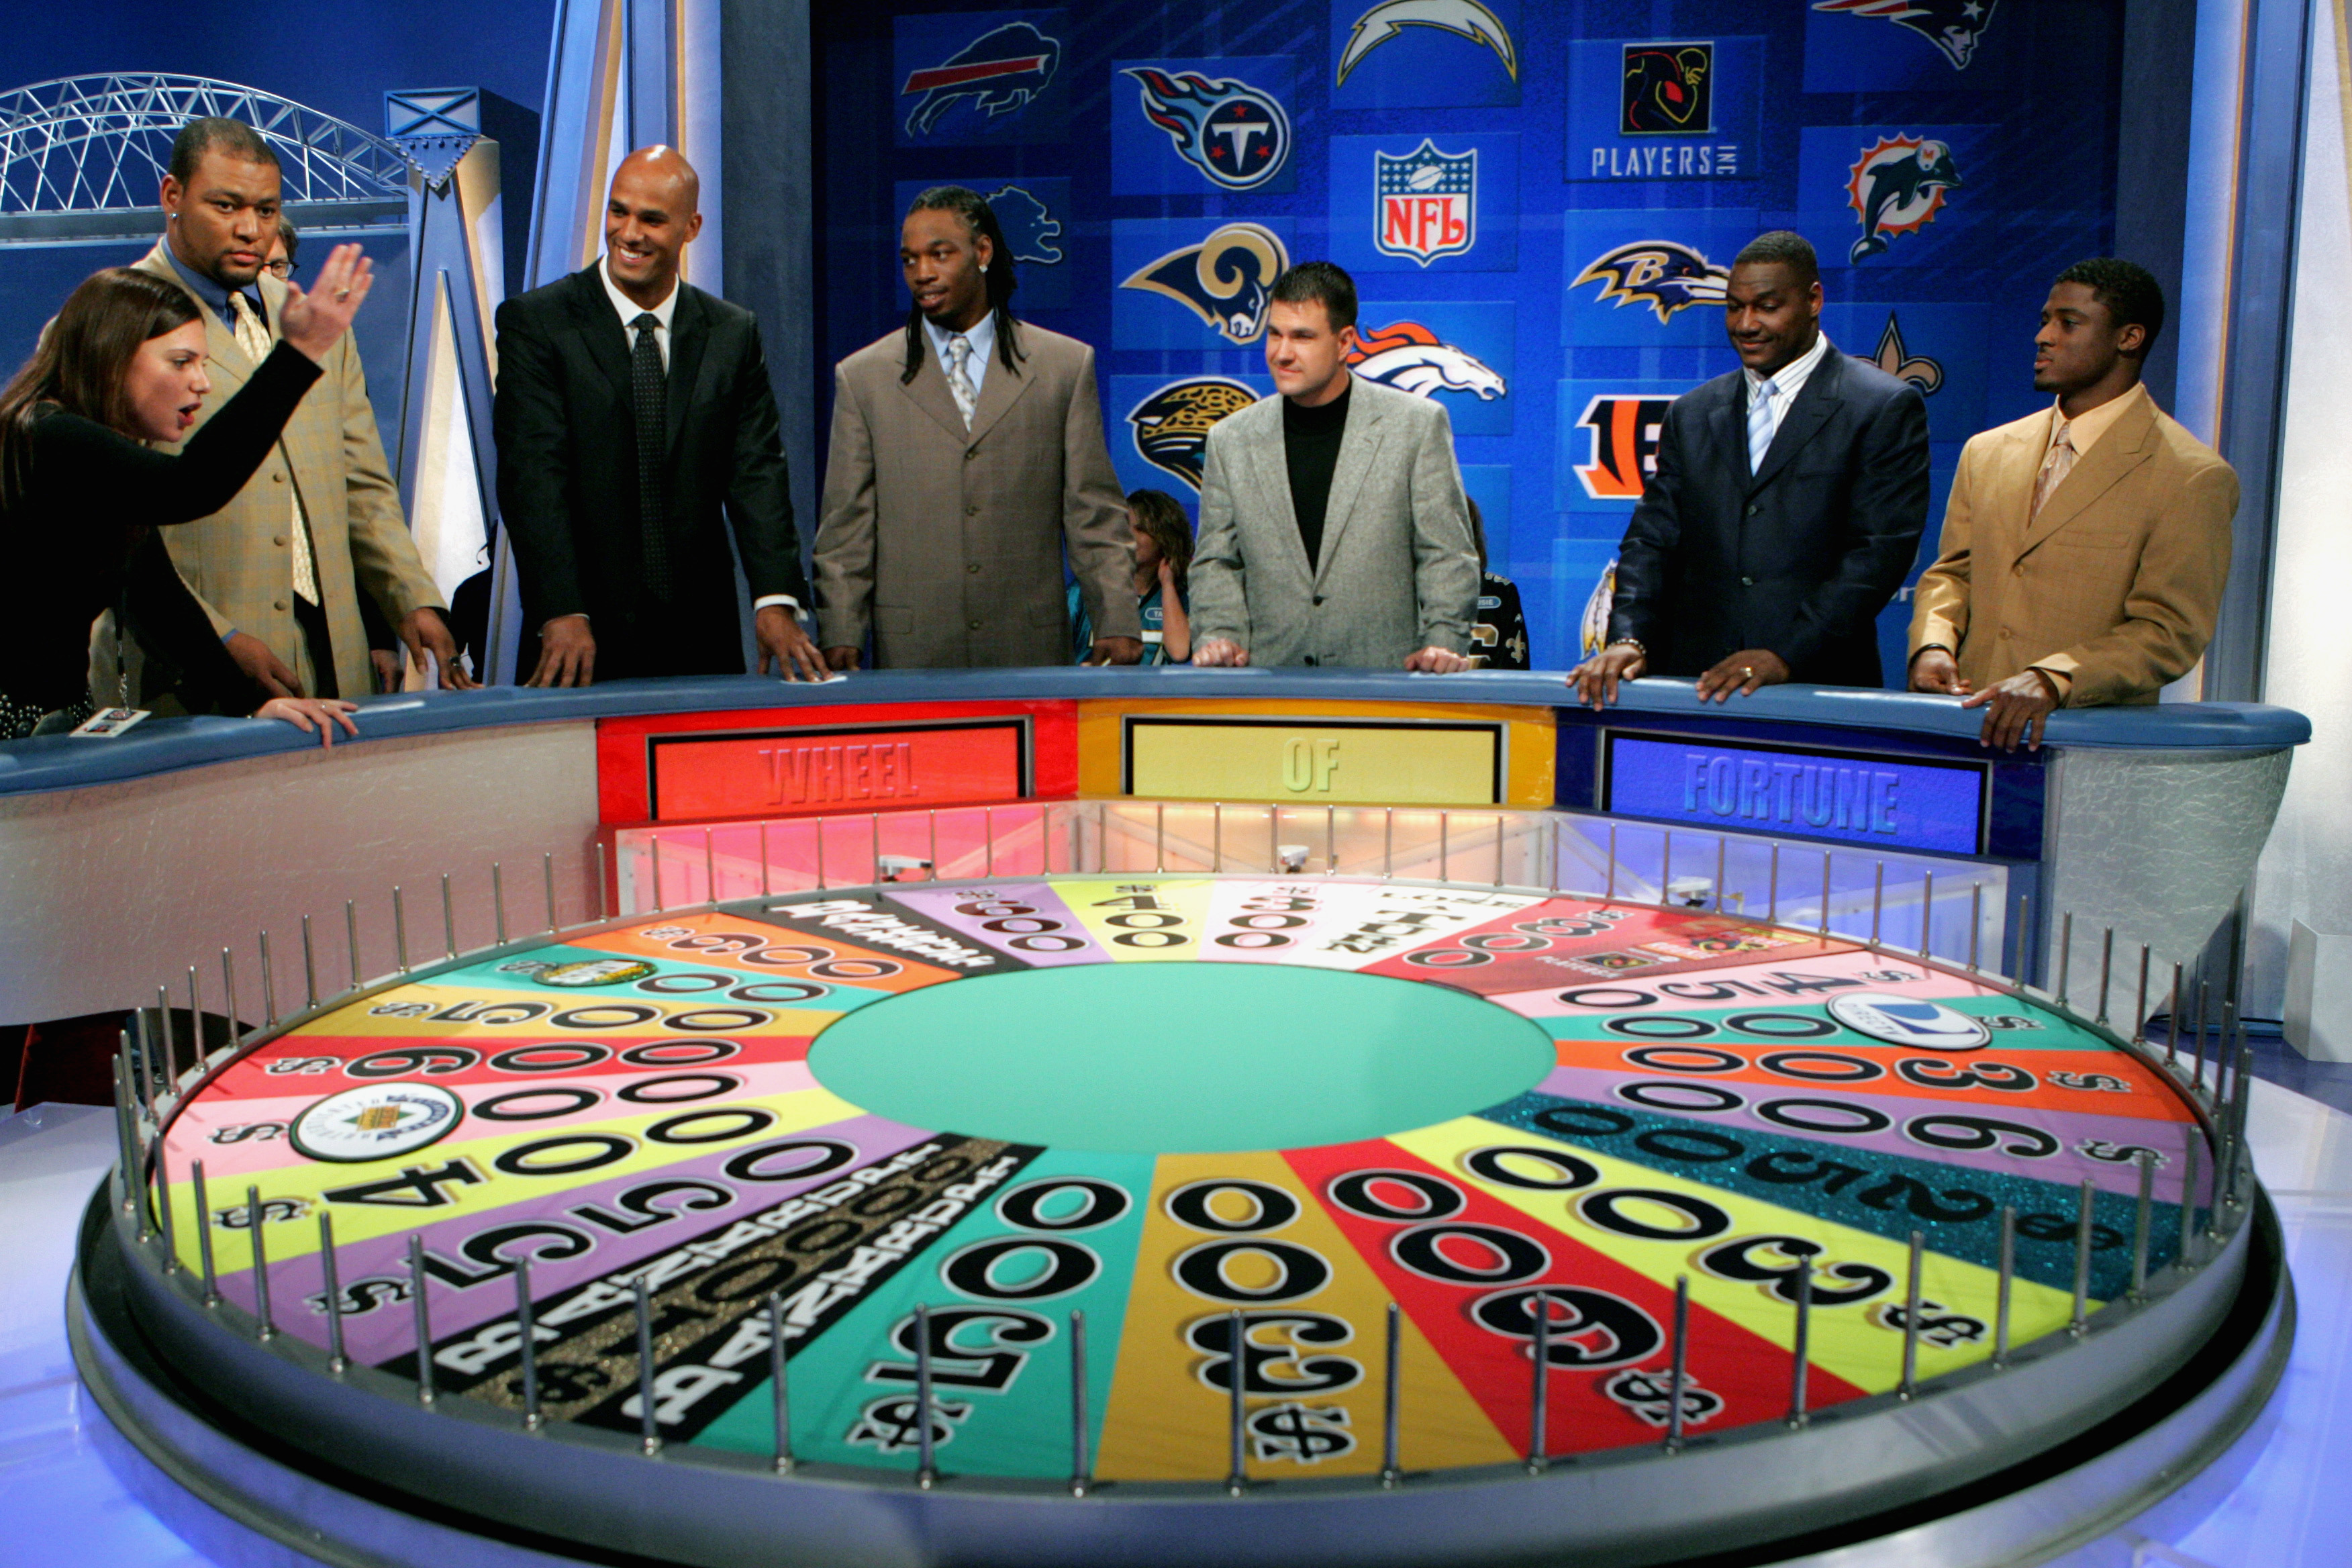 NFL球员展开竞争车轮的财富